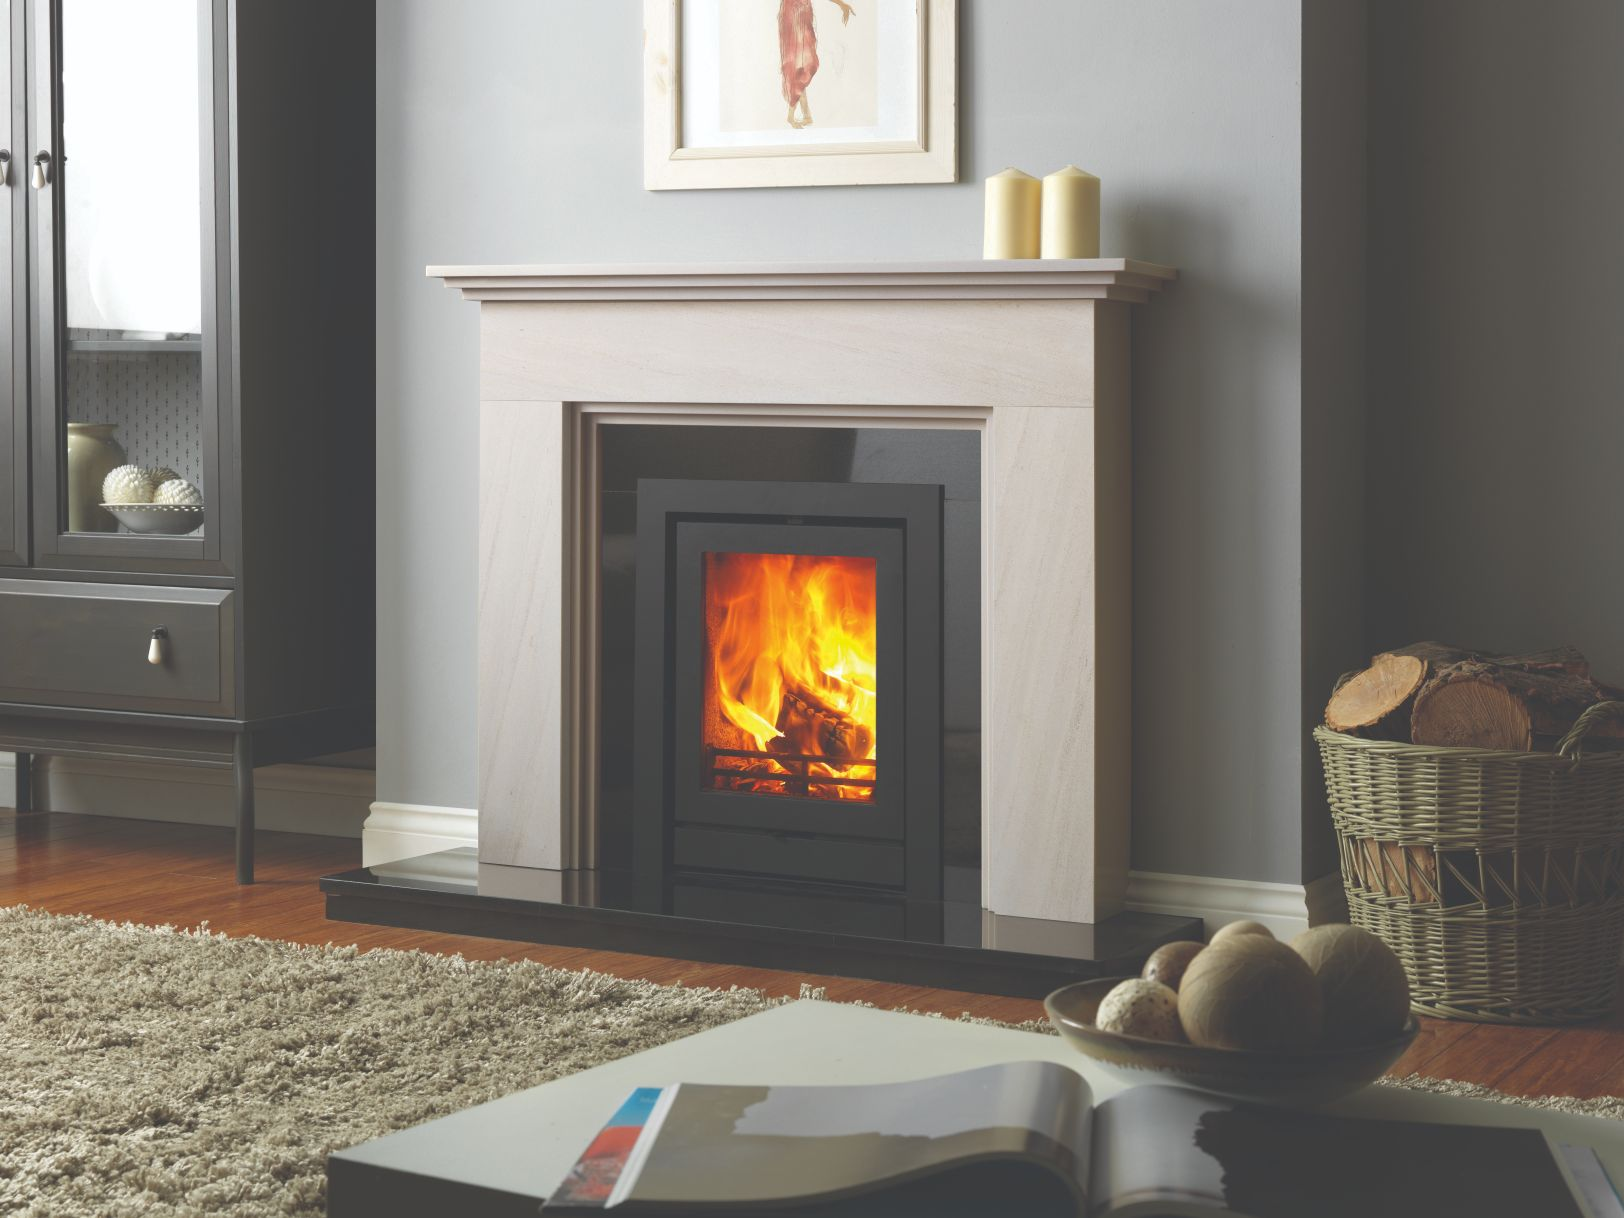 FPi5 Katia Limestone Fireplace Surround